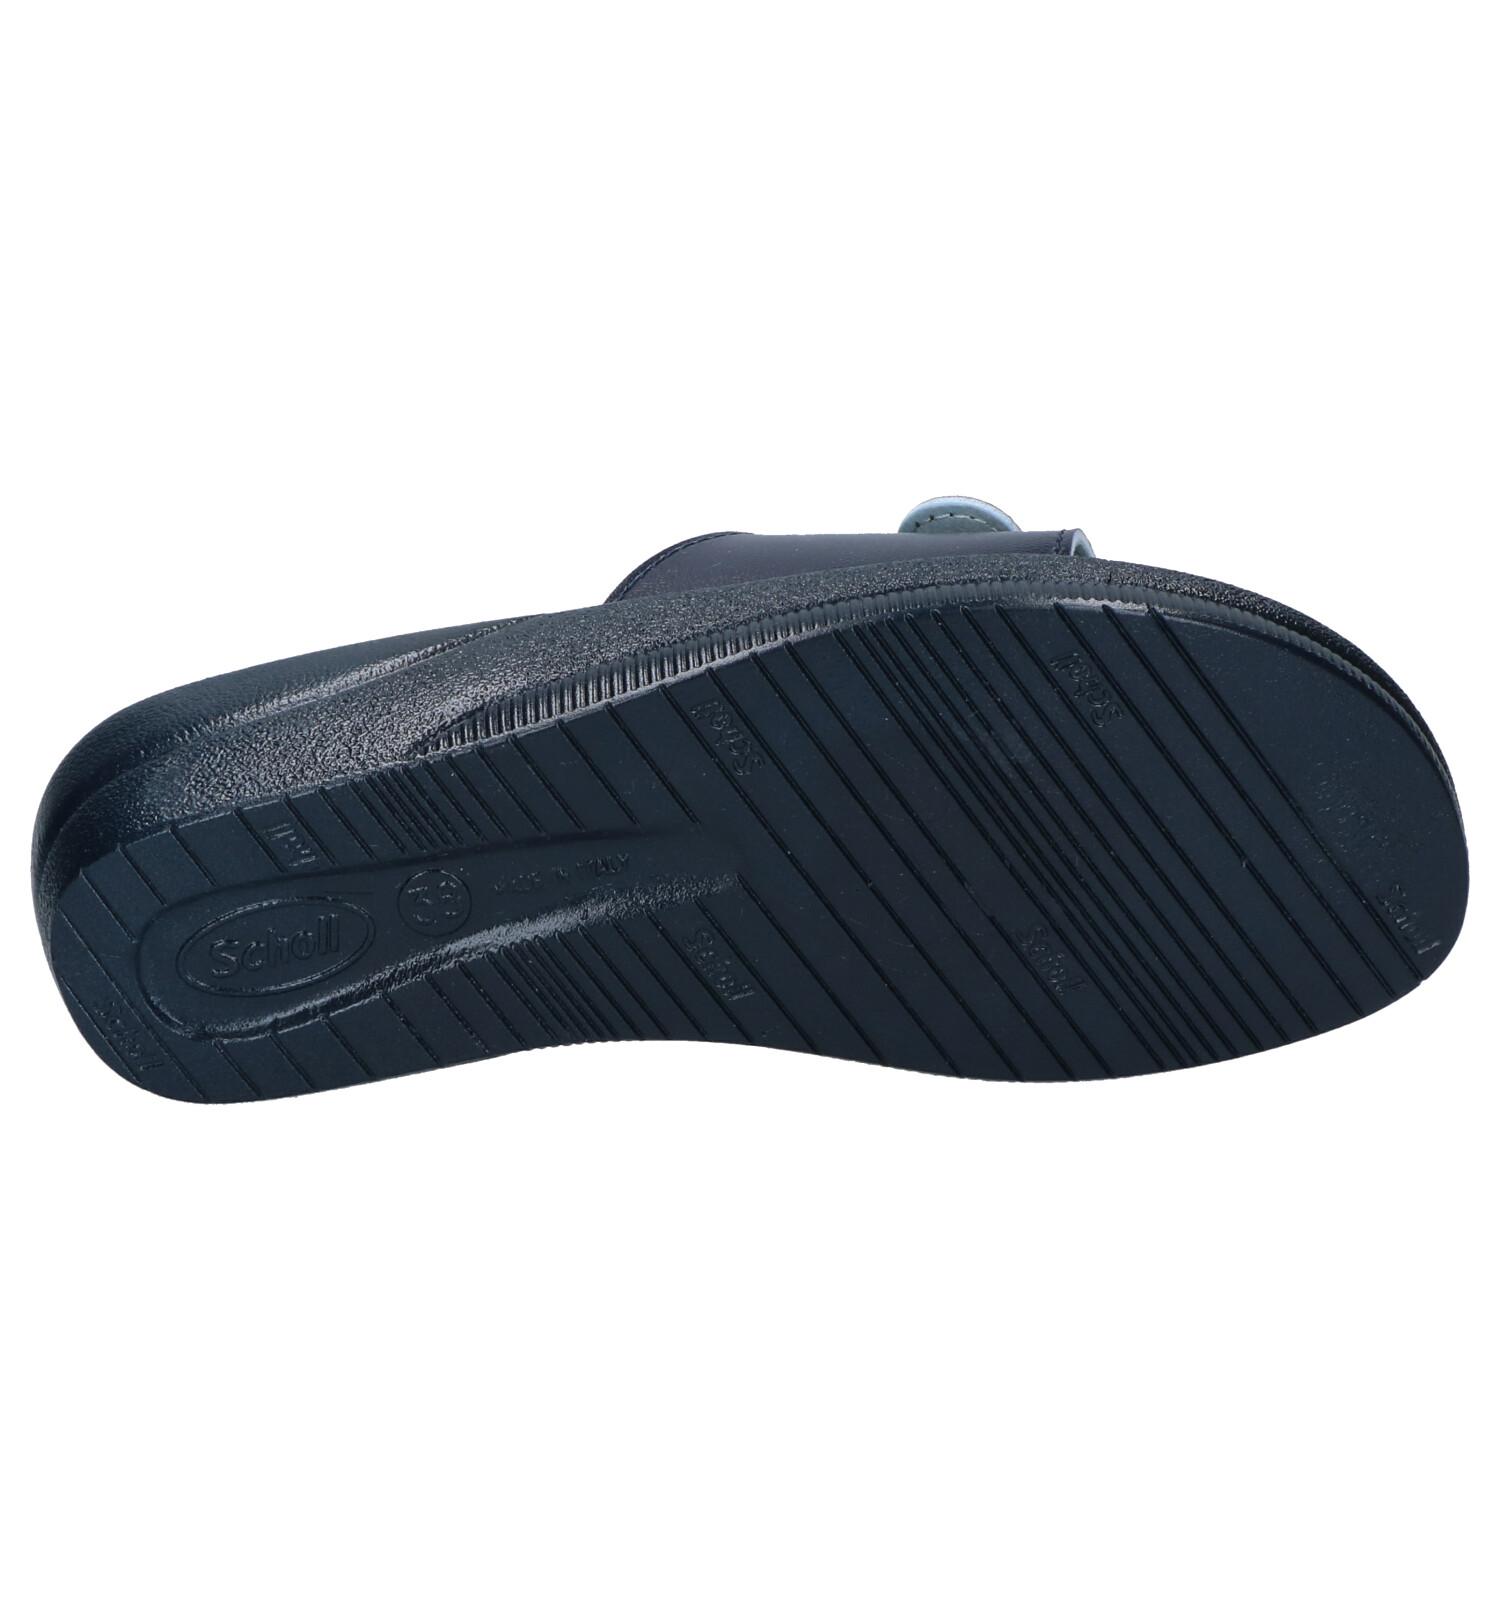 Slippers Scholl New Blauwe Scholl Massage FTl35ucKJ1